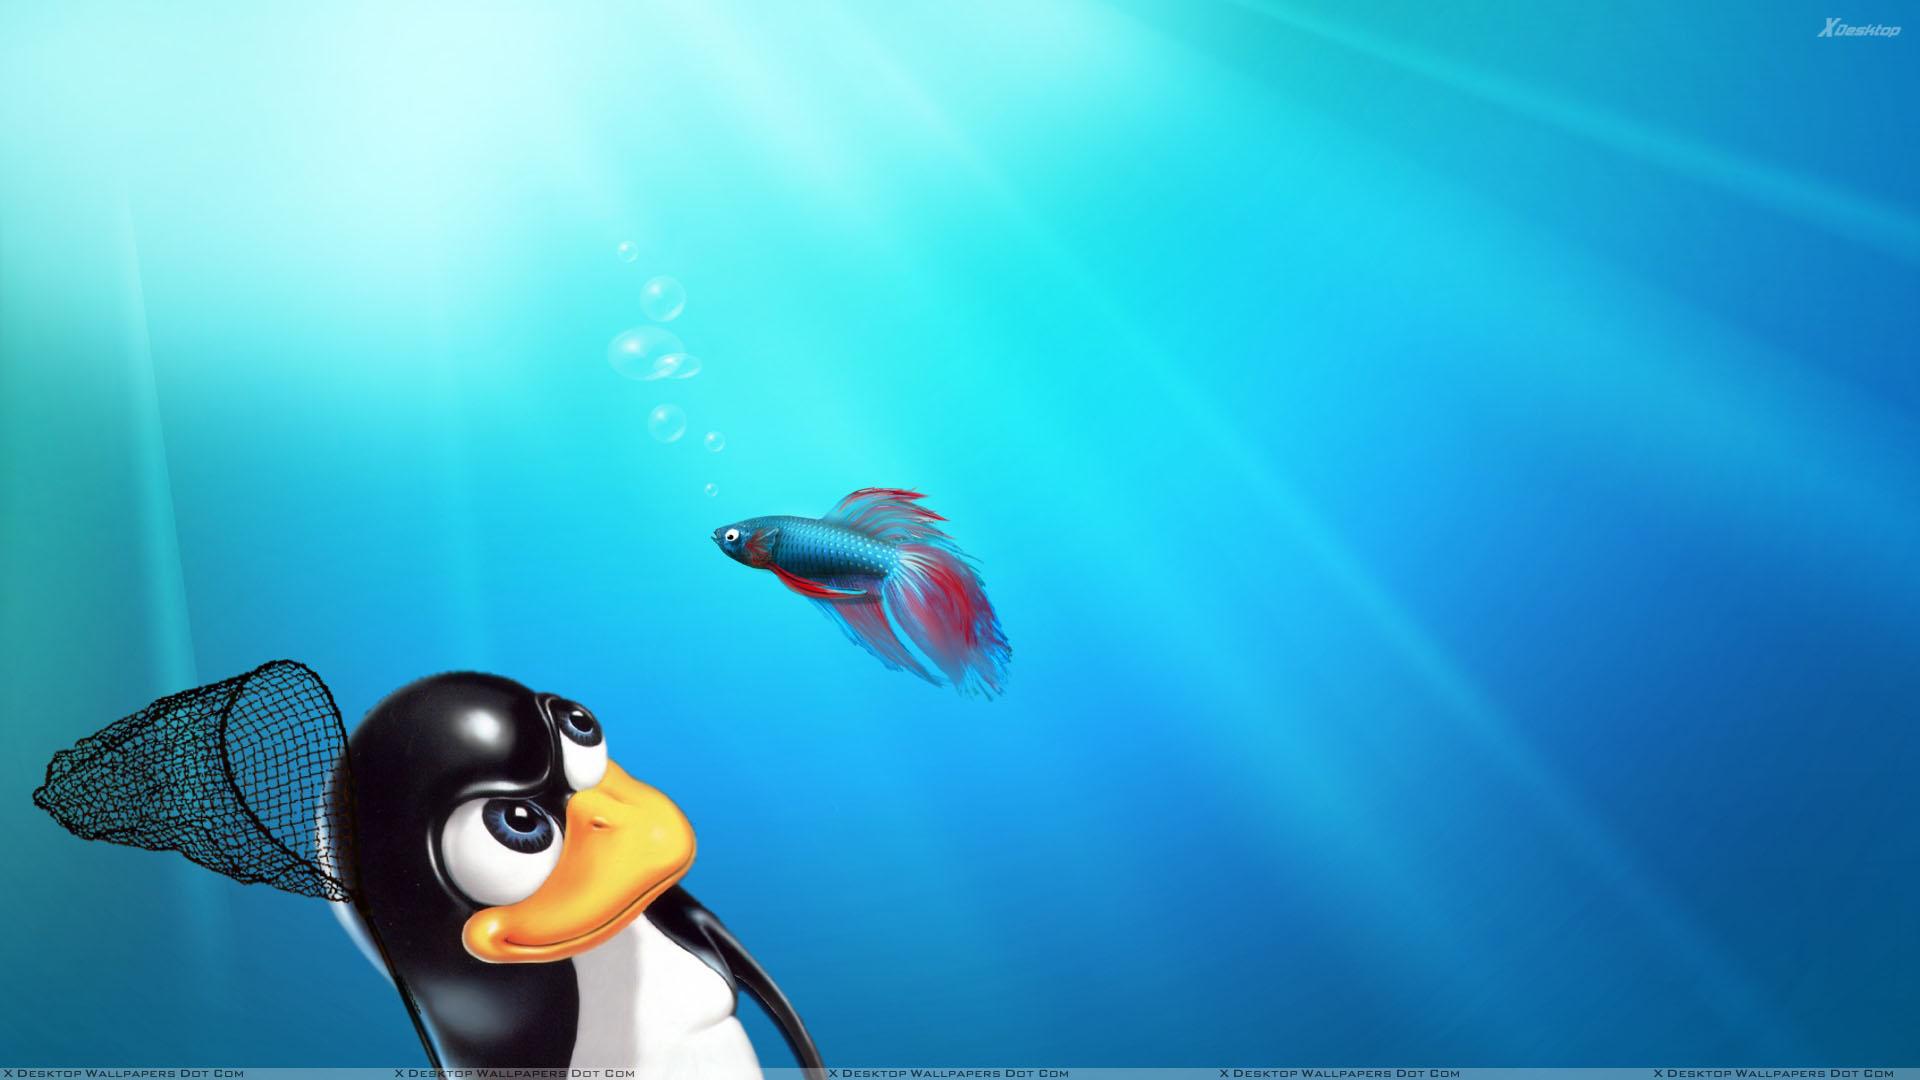 Linux vs Windows Blue Background Wallpaper 1920x1080